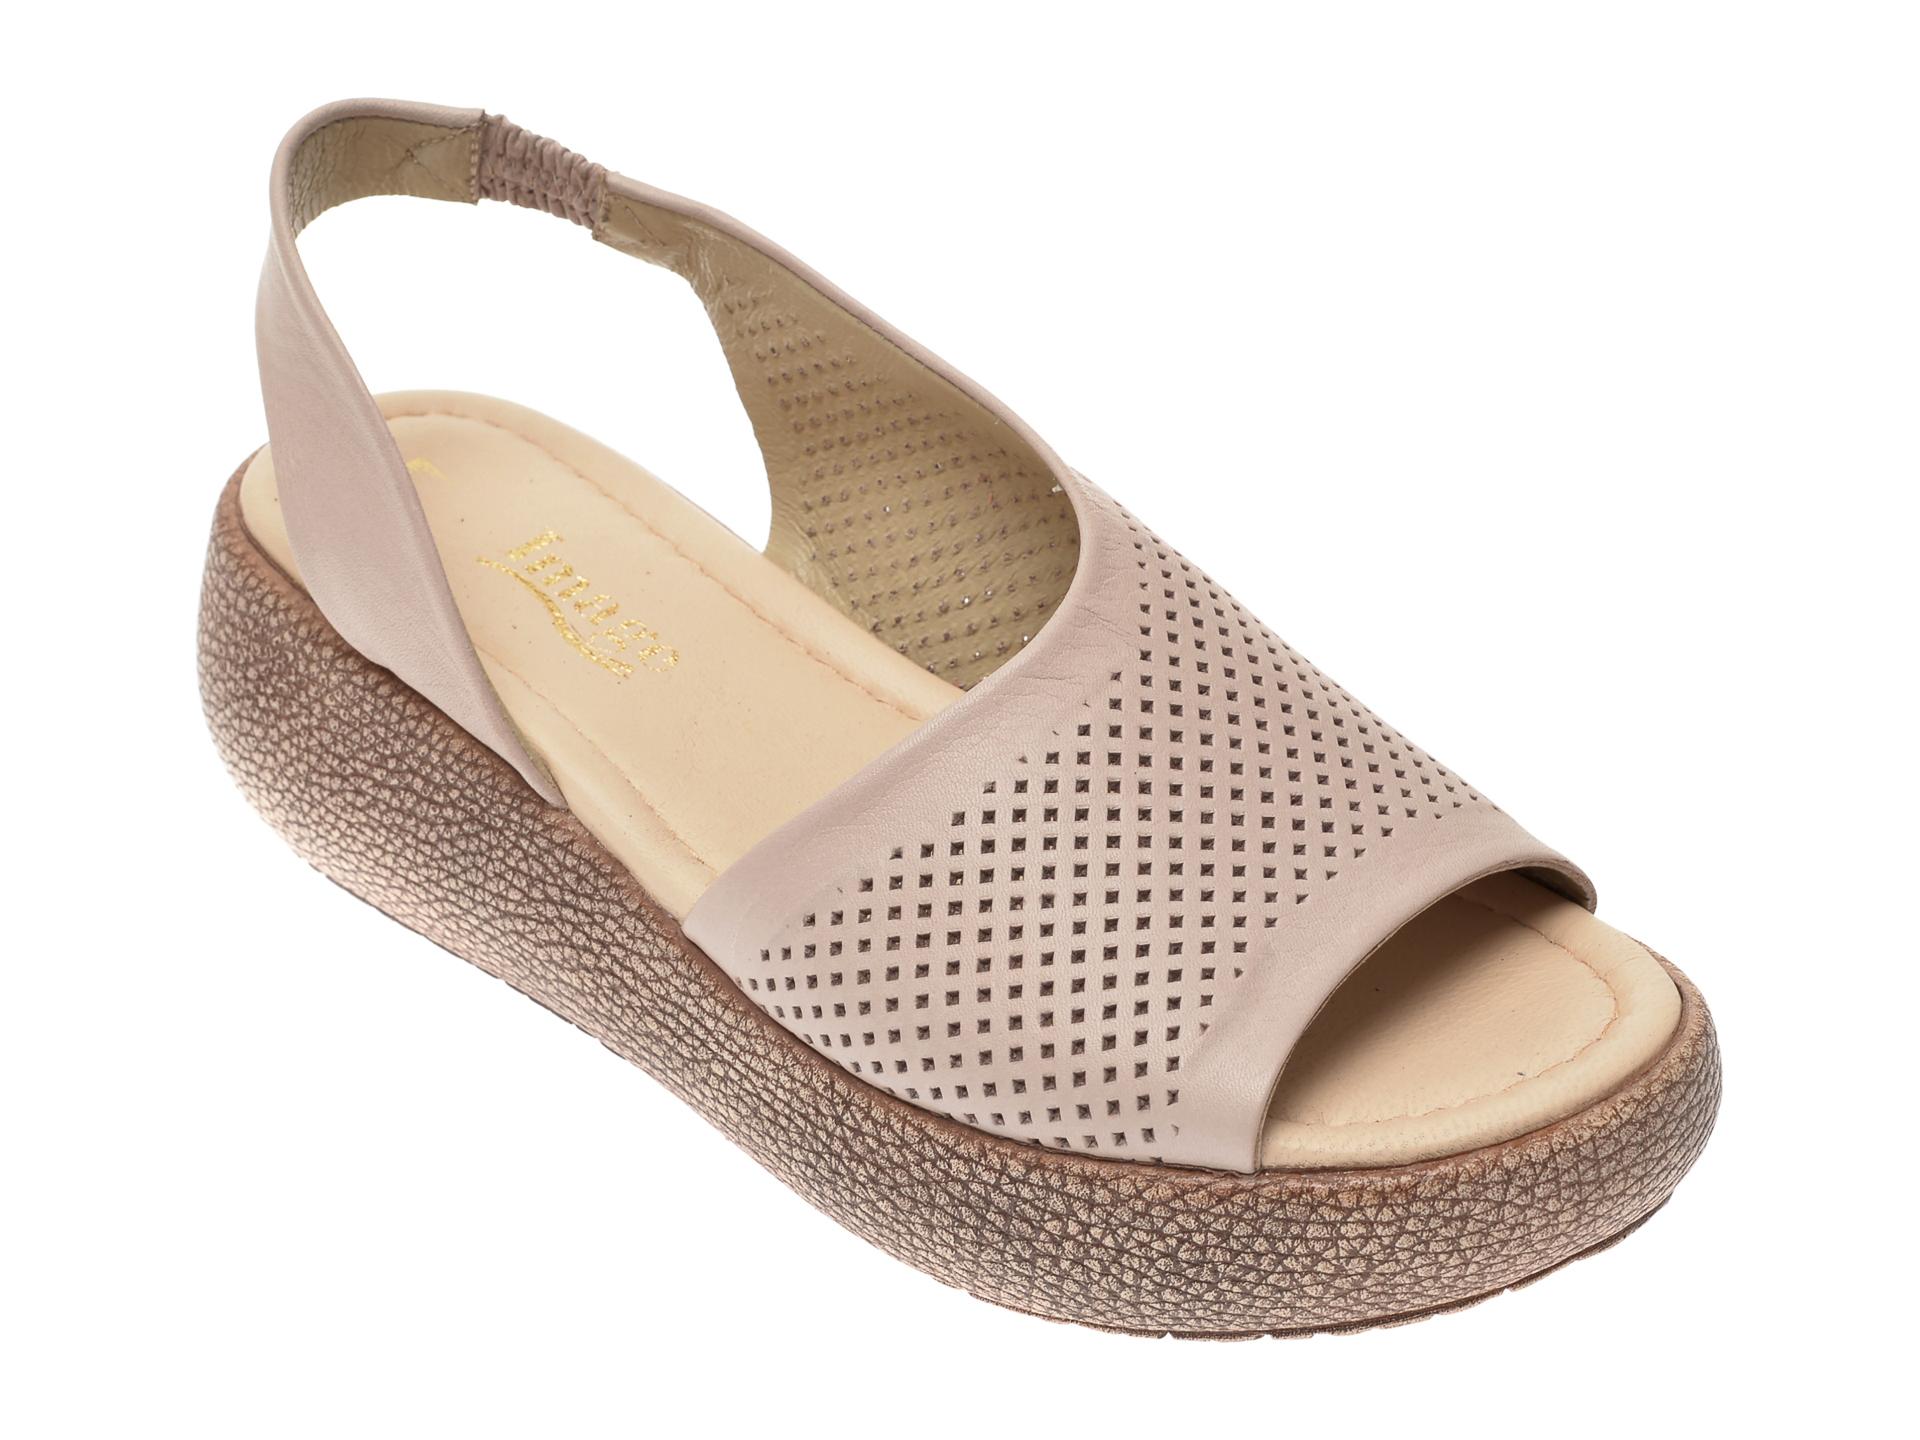 Sandale IMAGE gri, 6033, din piele naturala